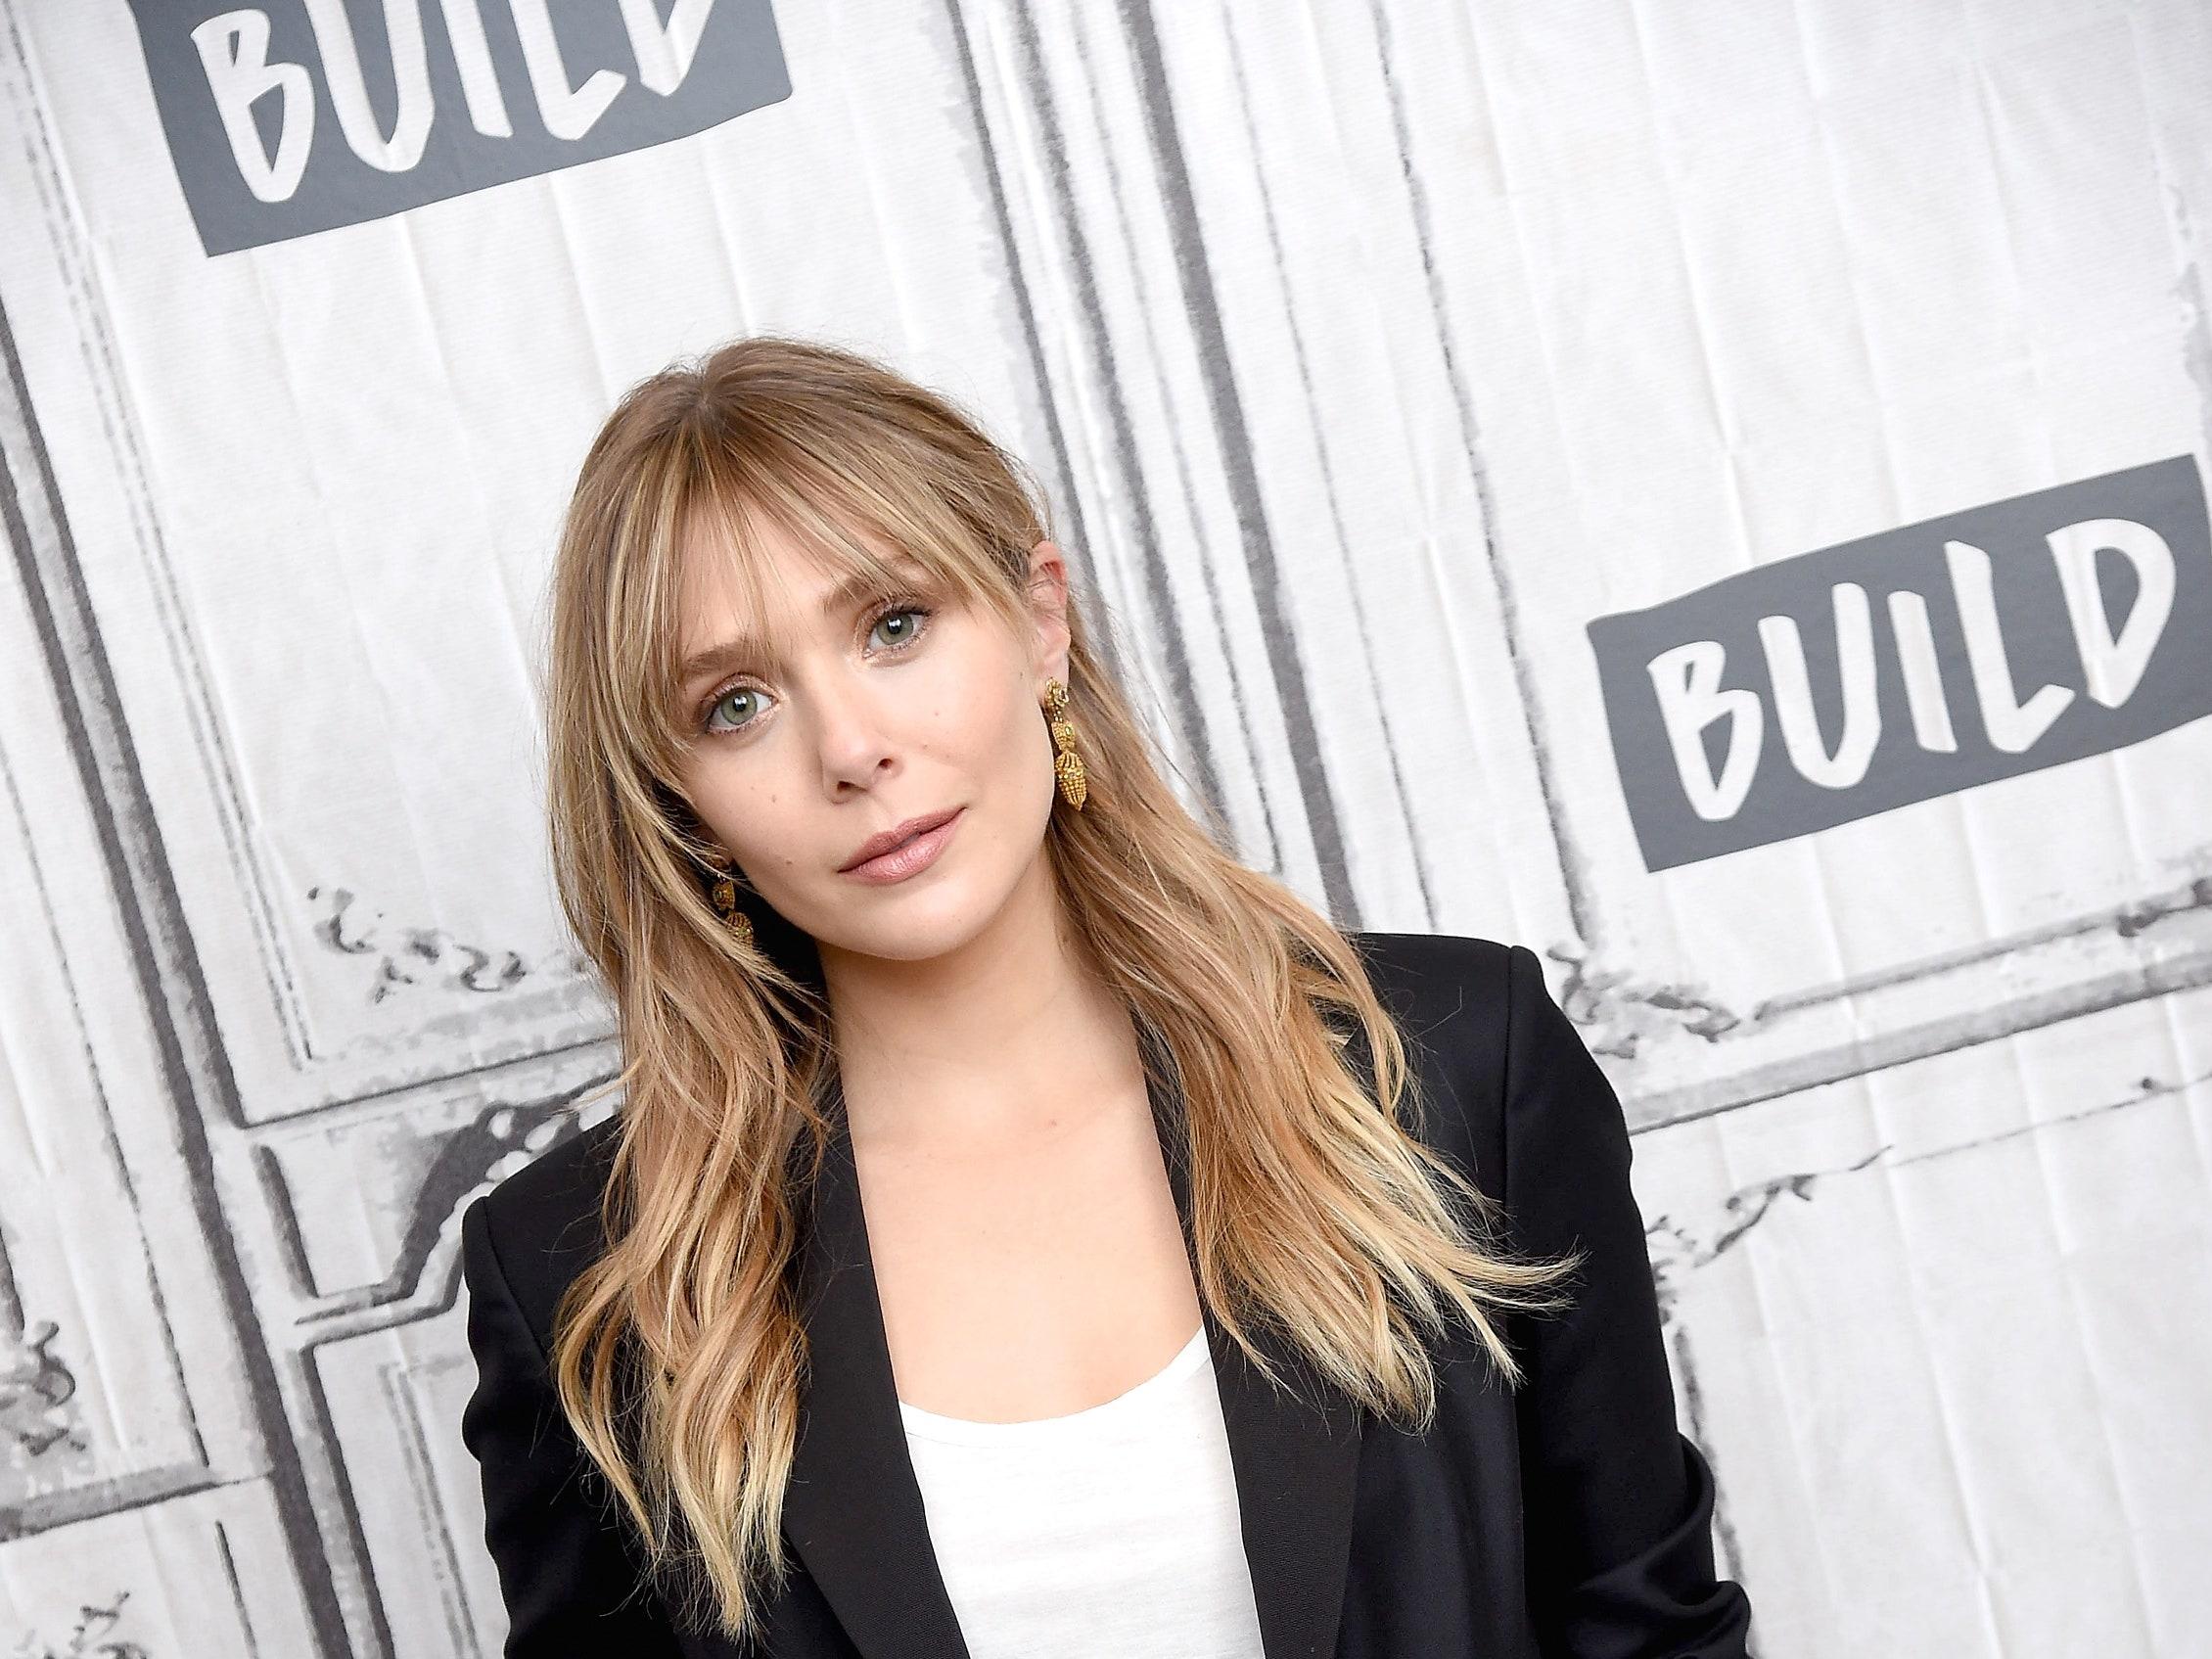 Elizabeth Olsen Career And Net Worth